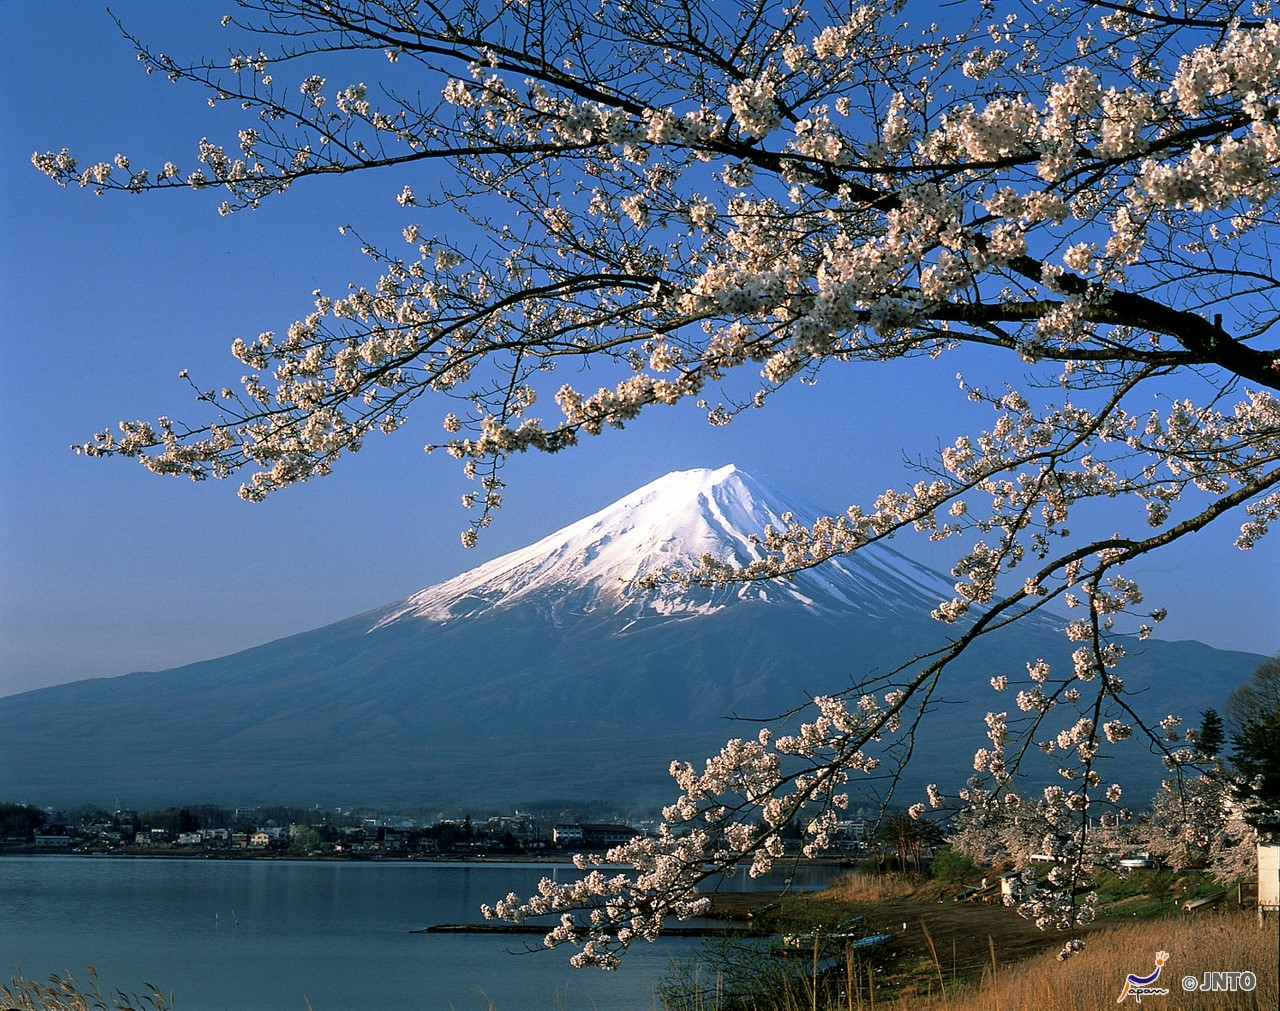 [By Bus]3D2N. Tokyo→Mt. Fuji 5th Sta., Hida Takayama, Lake Kawaguchiko→Tokyo [TT20]